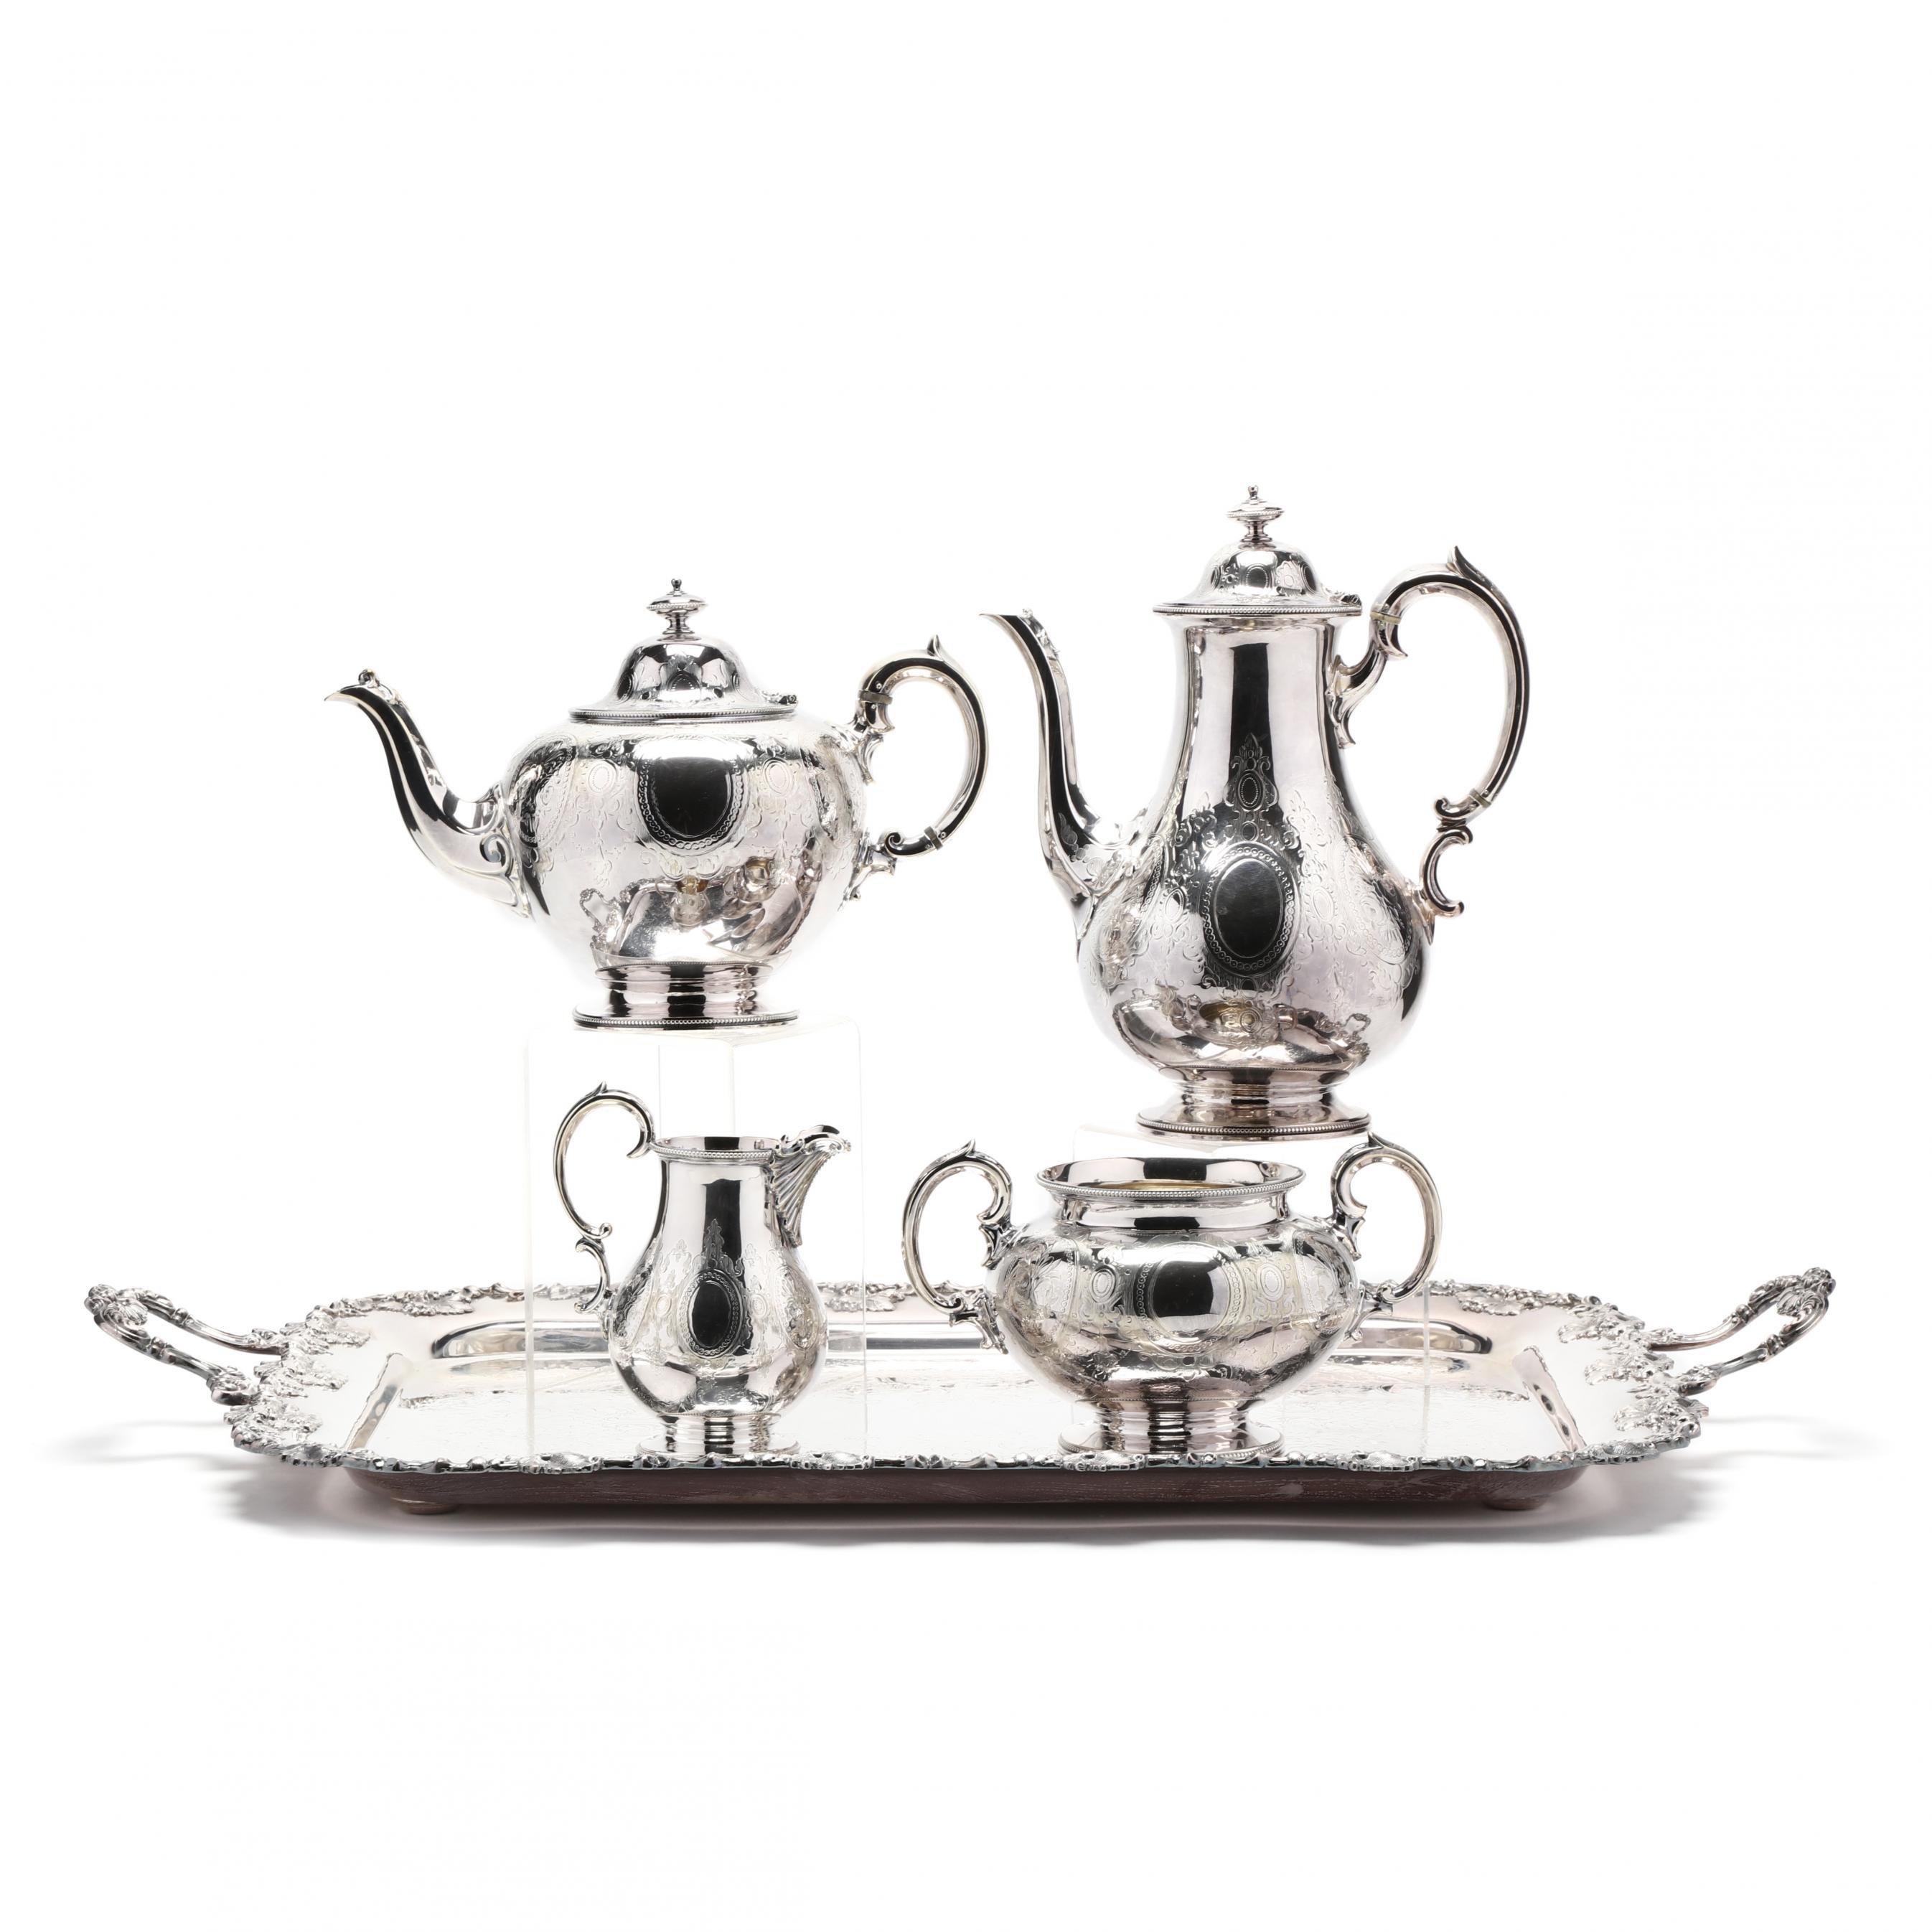 victorian-silverplate-tea-coffee-service